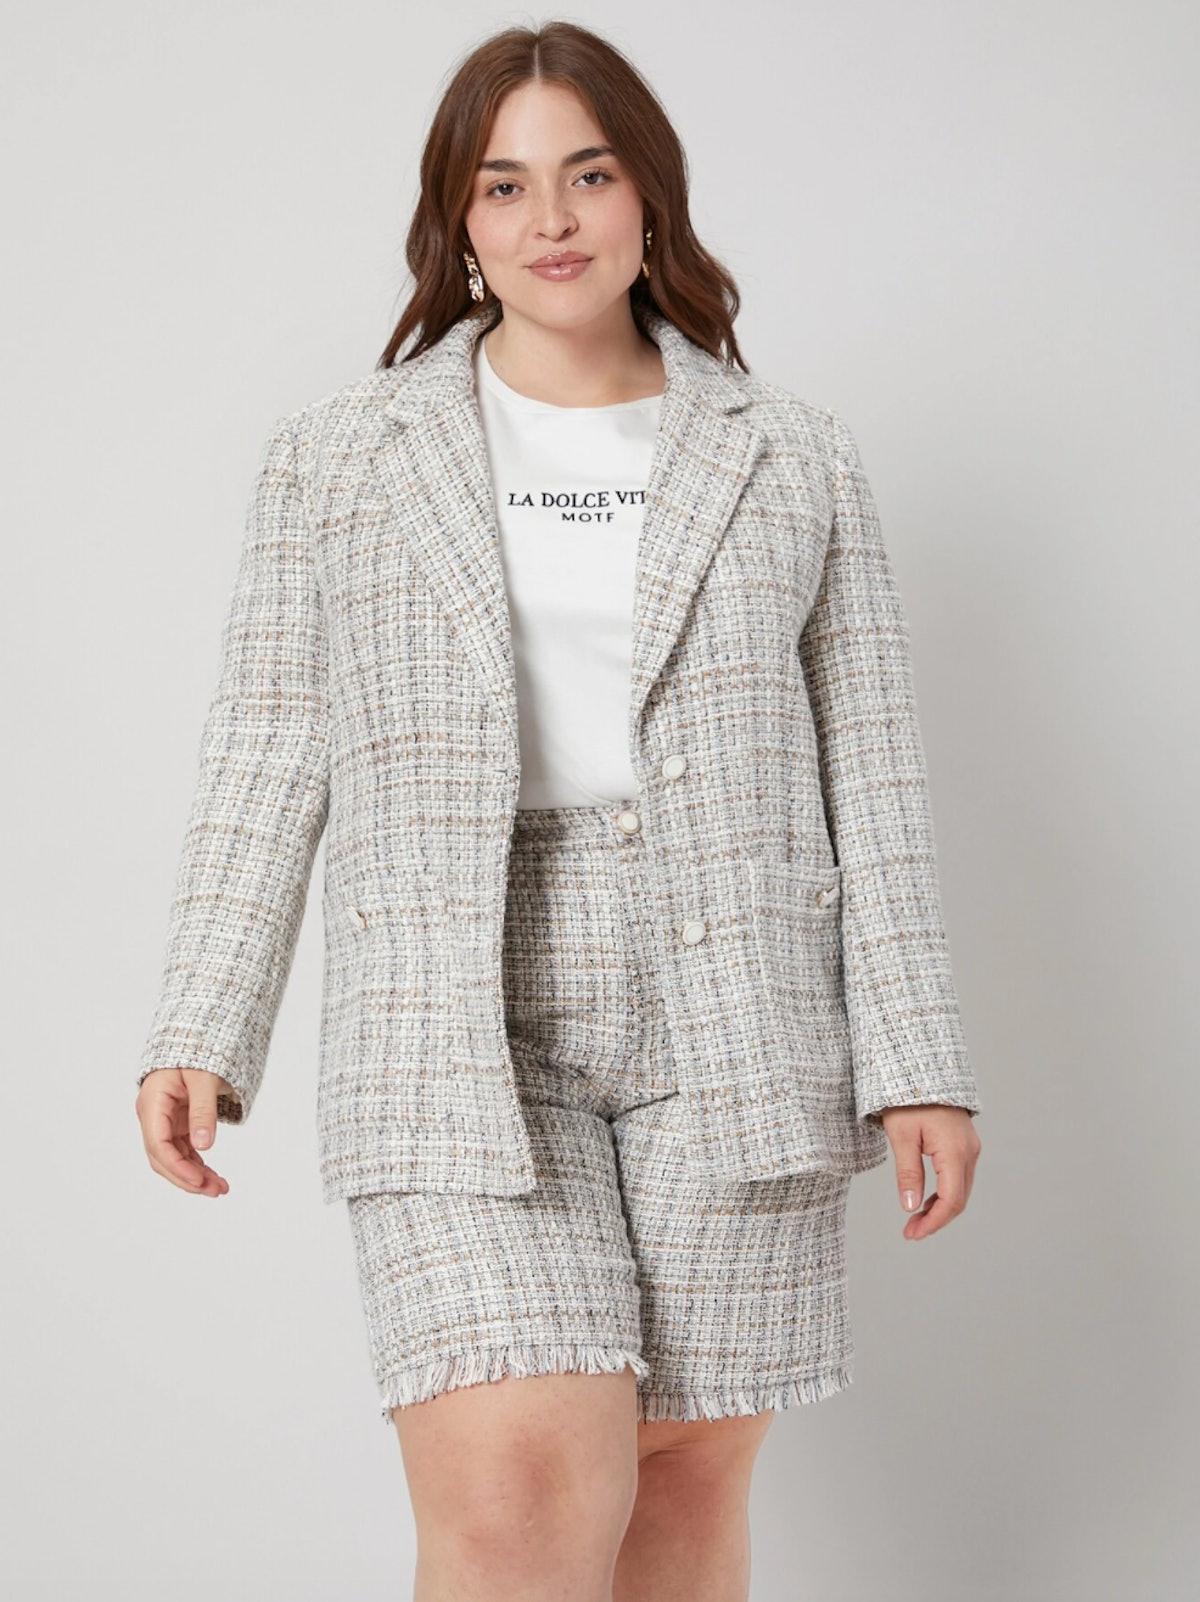 MOTF Premium Plus Structured Tweed Blazer